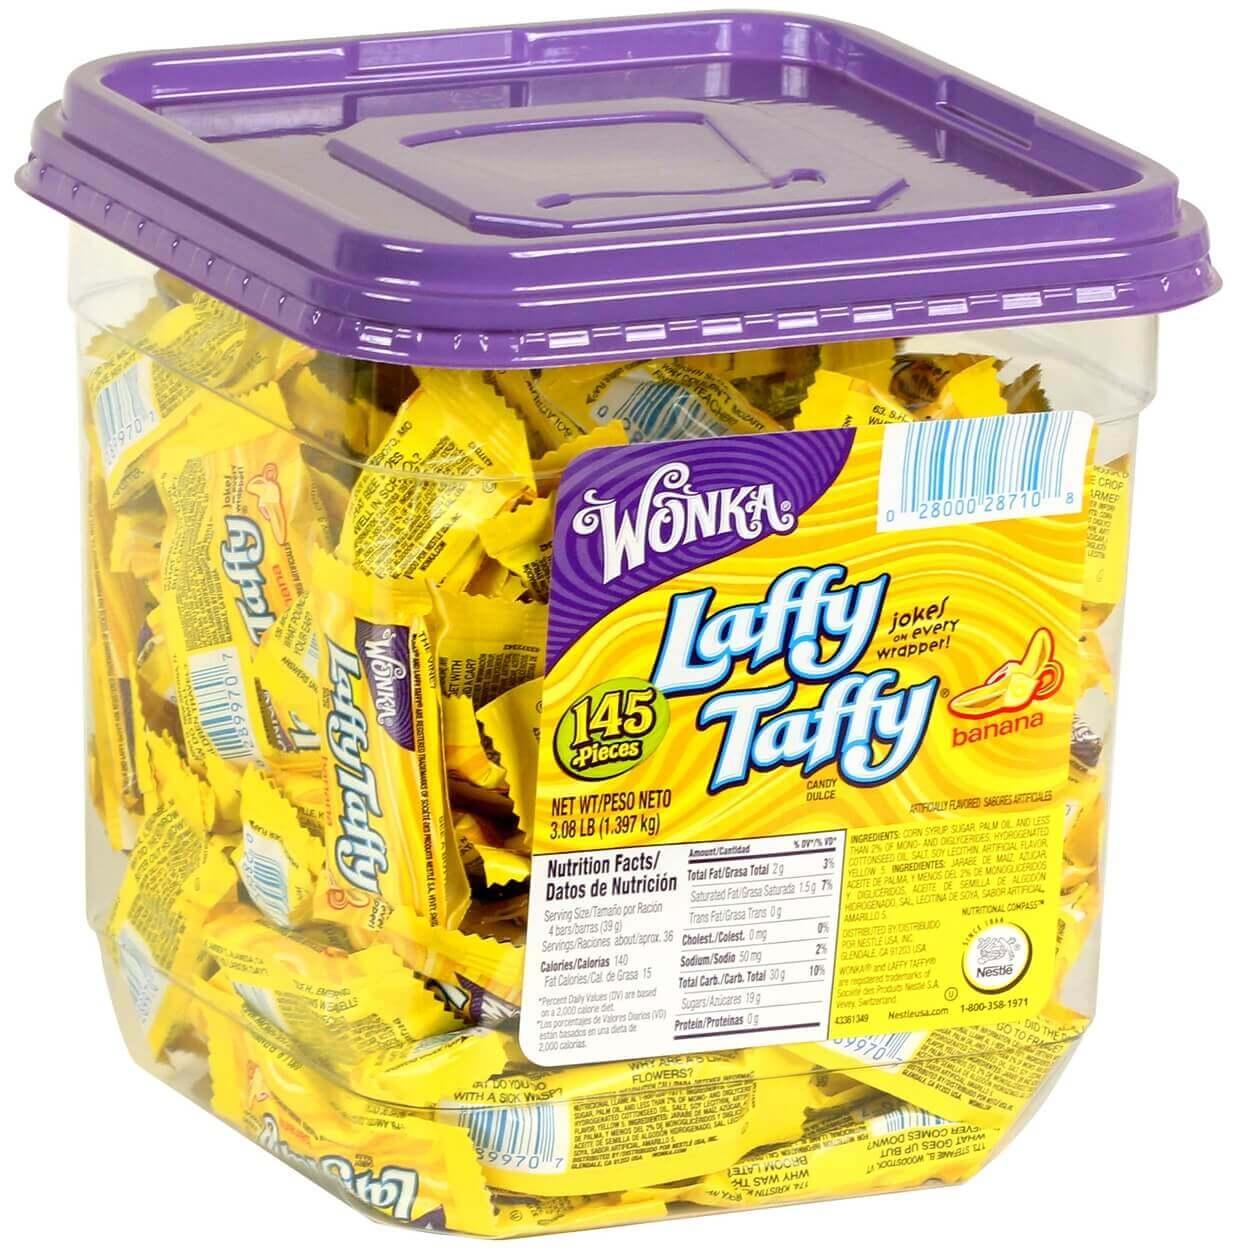 Wonka Laffy Taffy Banana 145st